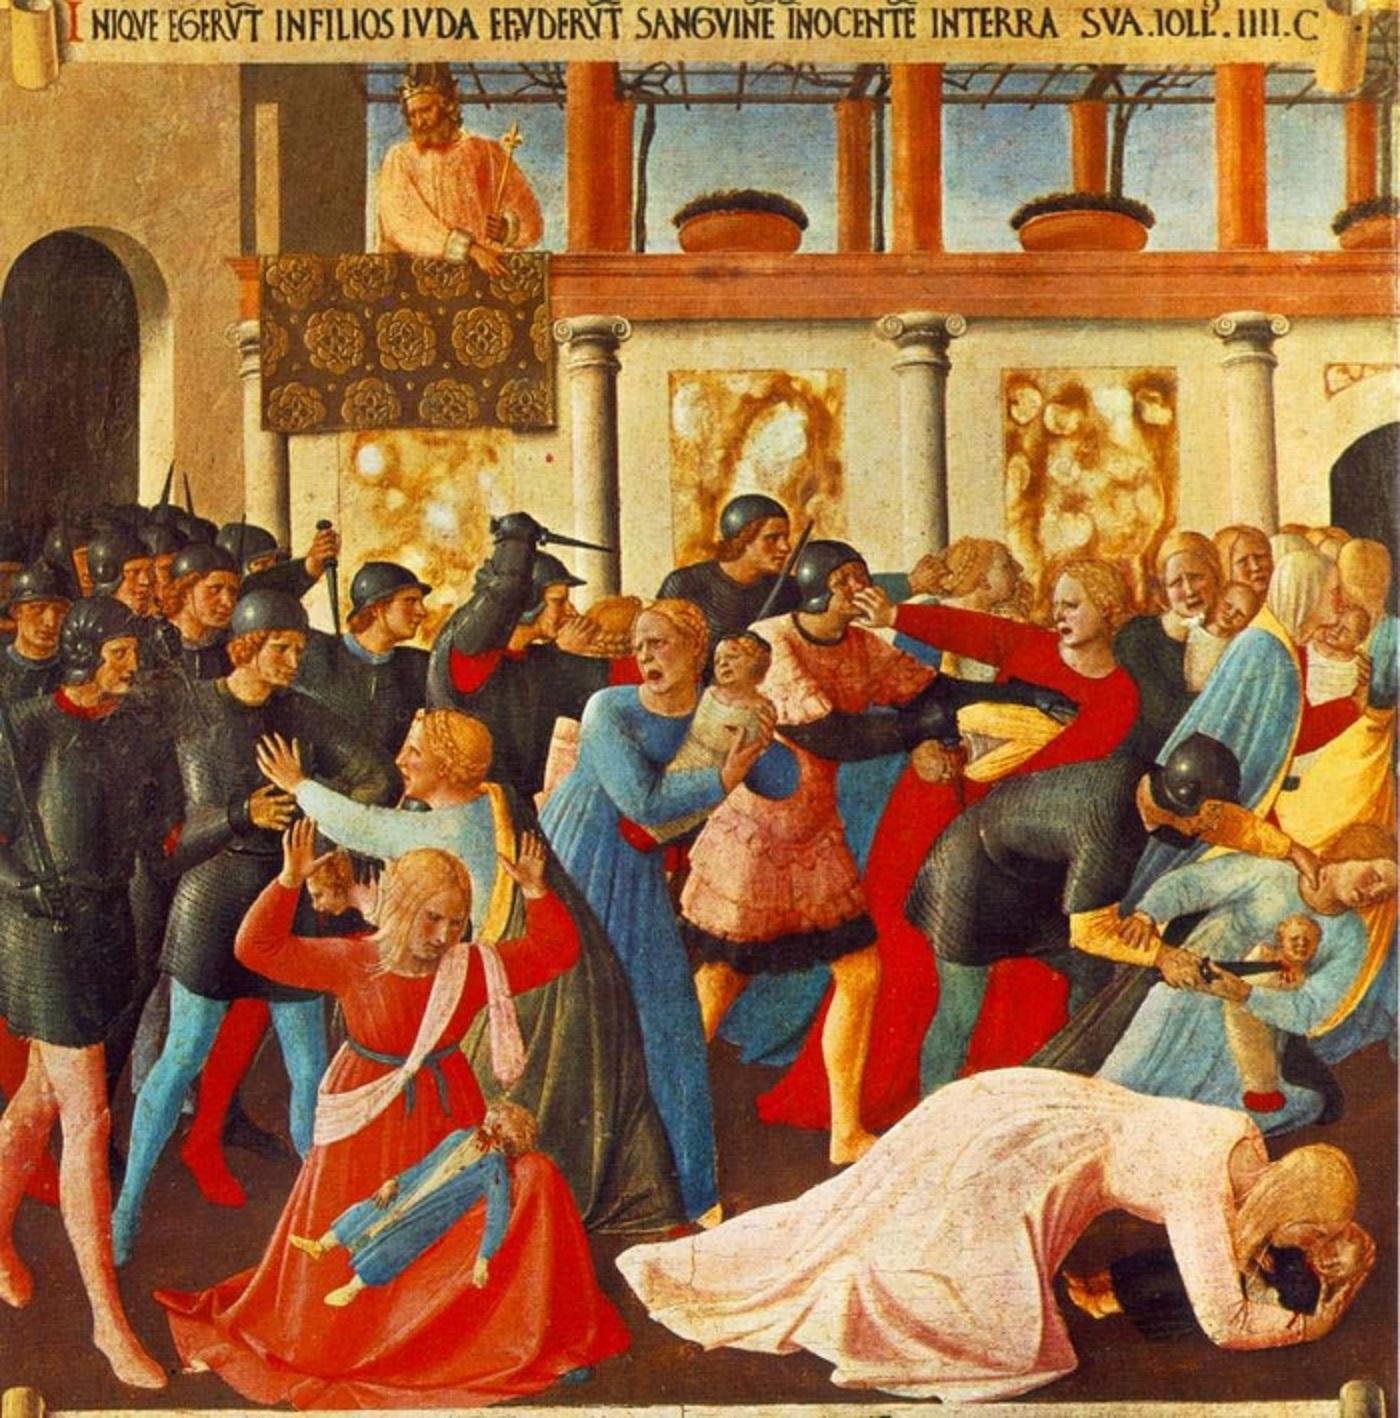 Saints innocents 7.jpg